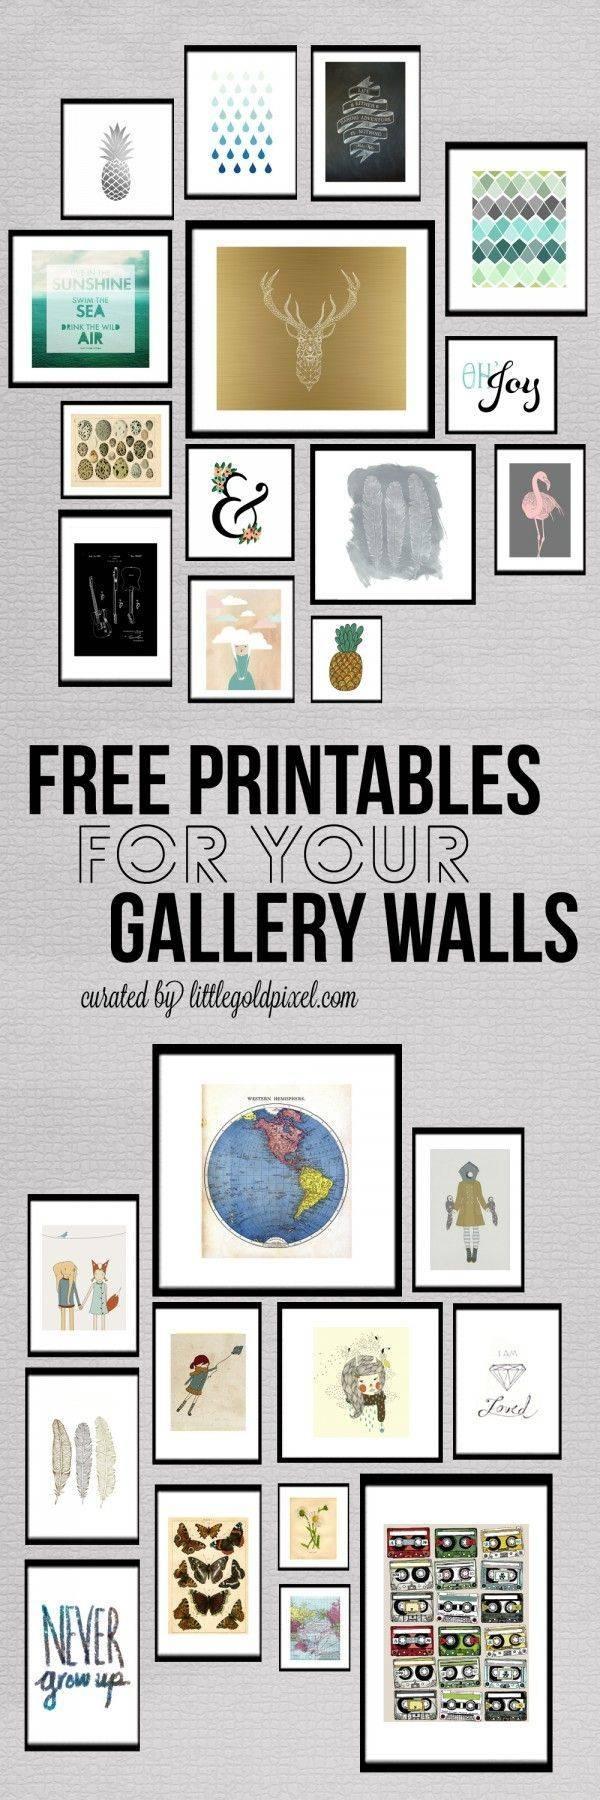 Best 25+ Teen Wall Art Ideas On Pinterest   Teen Wall Decor With Regard To Current Teenage Wall Art (View 8 of 30)